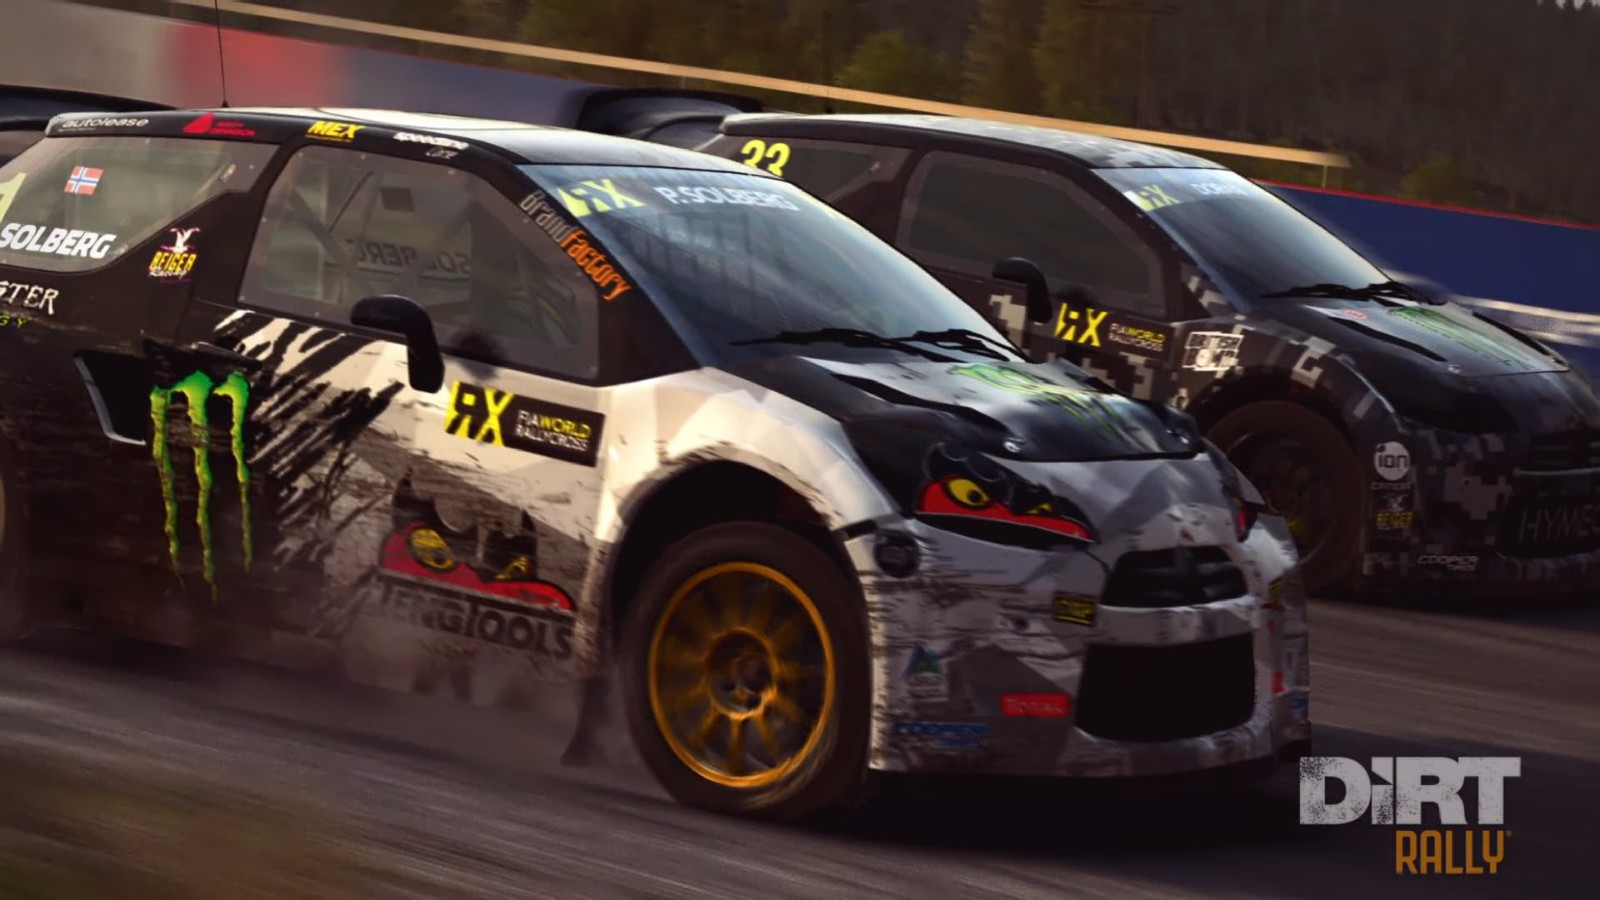 20180415085556_1.jpg - DiRT Rally